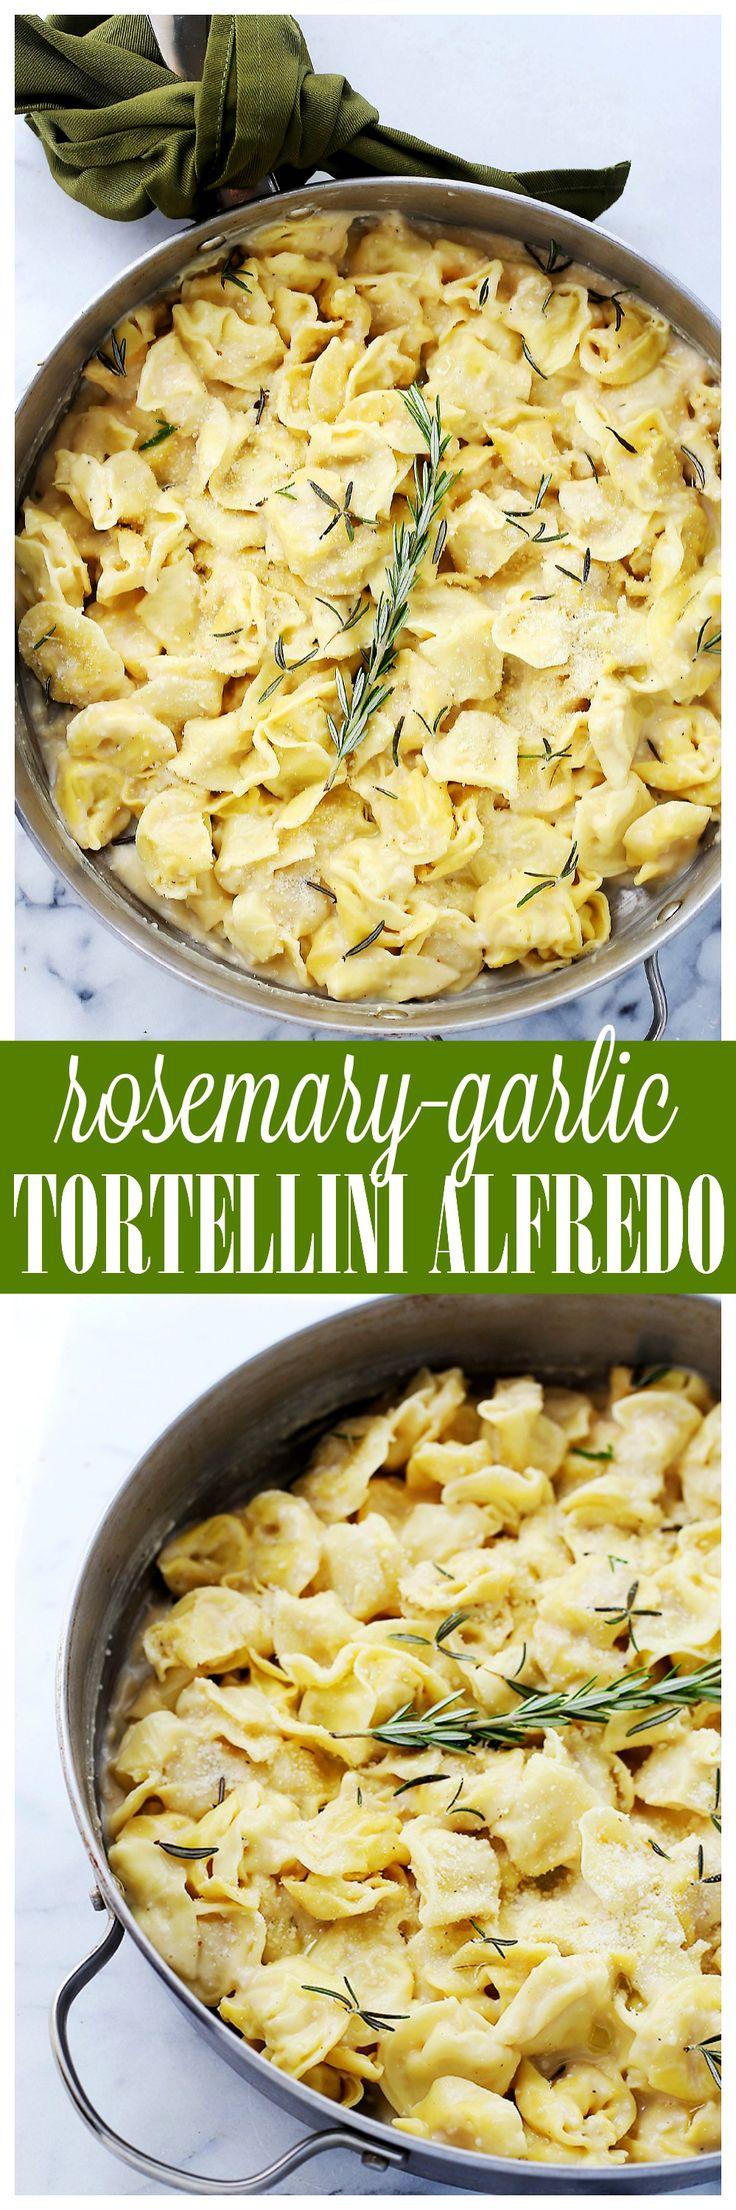 Rosemary Garlic Tortellini Alfredo - Easy, creamy, garlicky, 30-minute dinner with cheese tortellini and a lightened-up, homemade, flavorful Alfredo sauce.